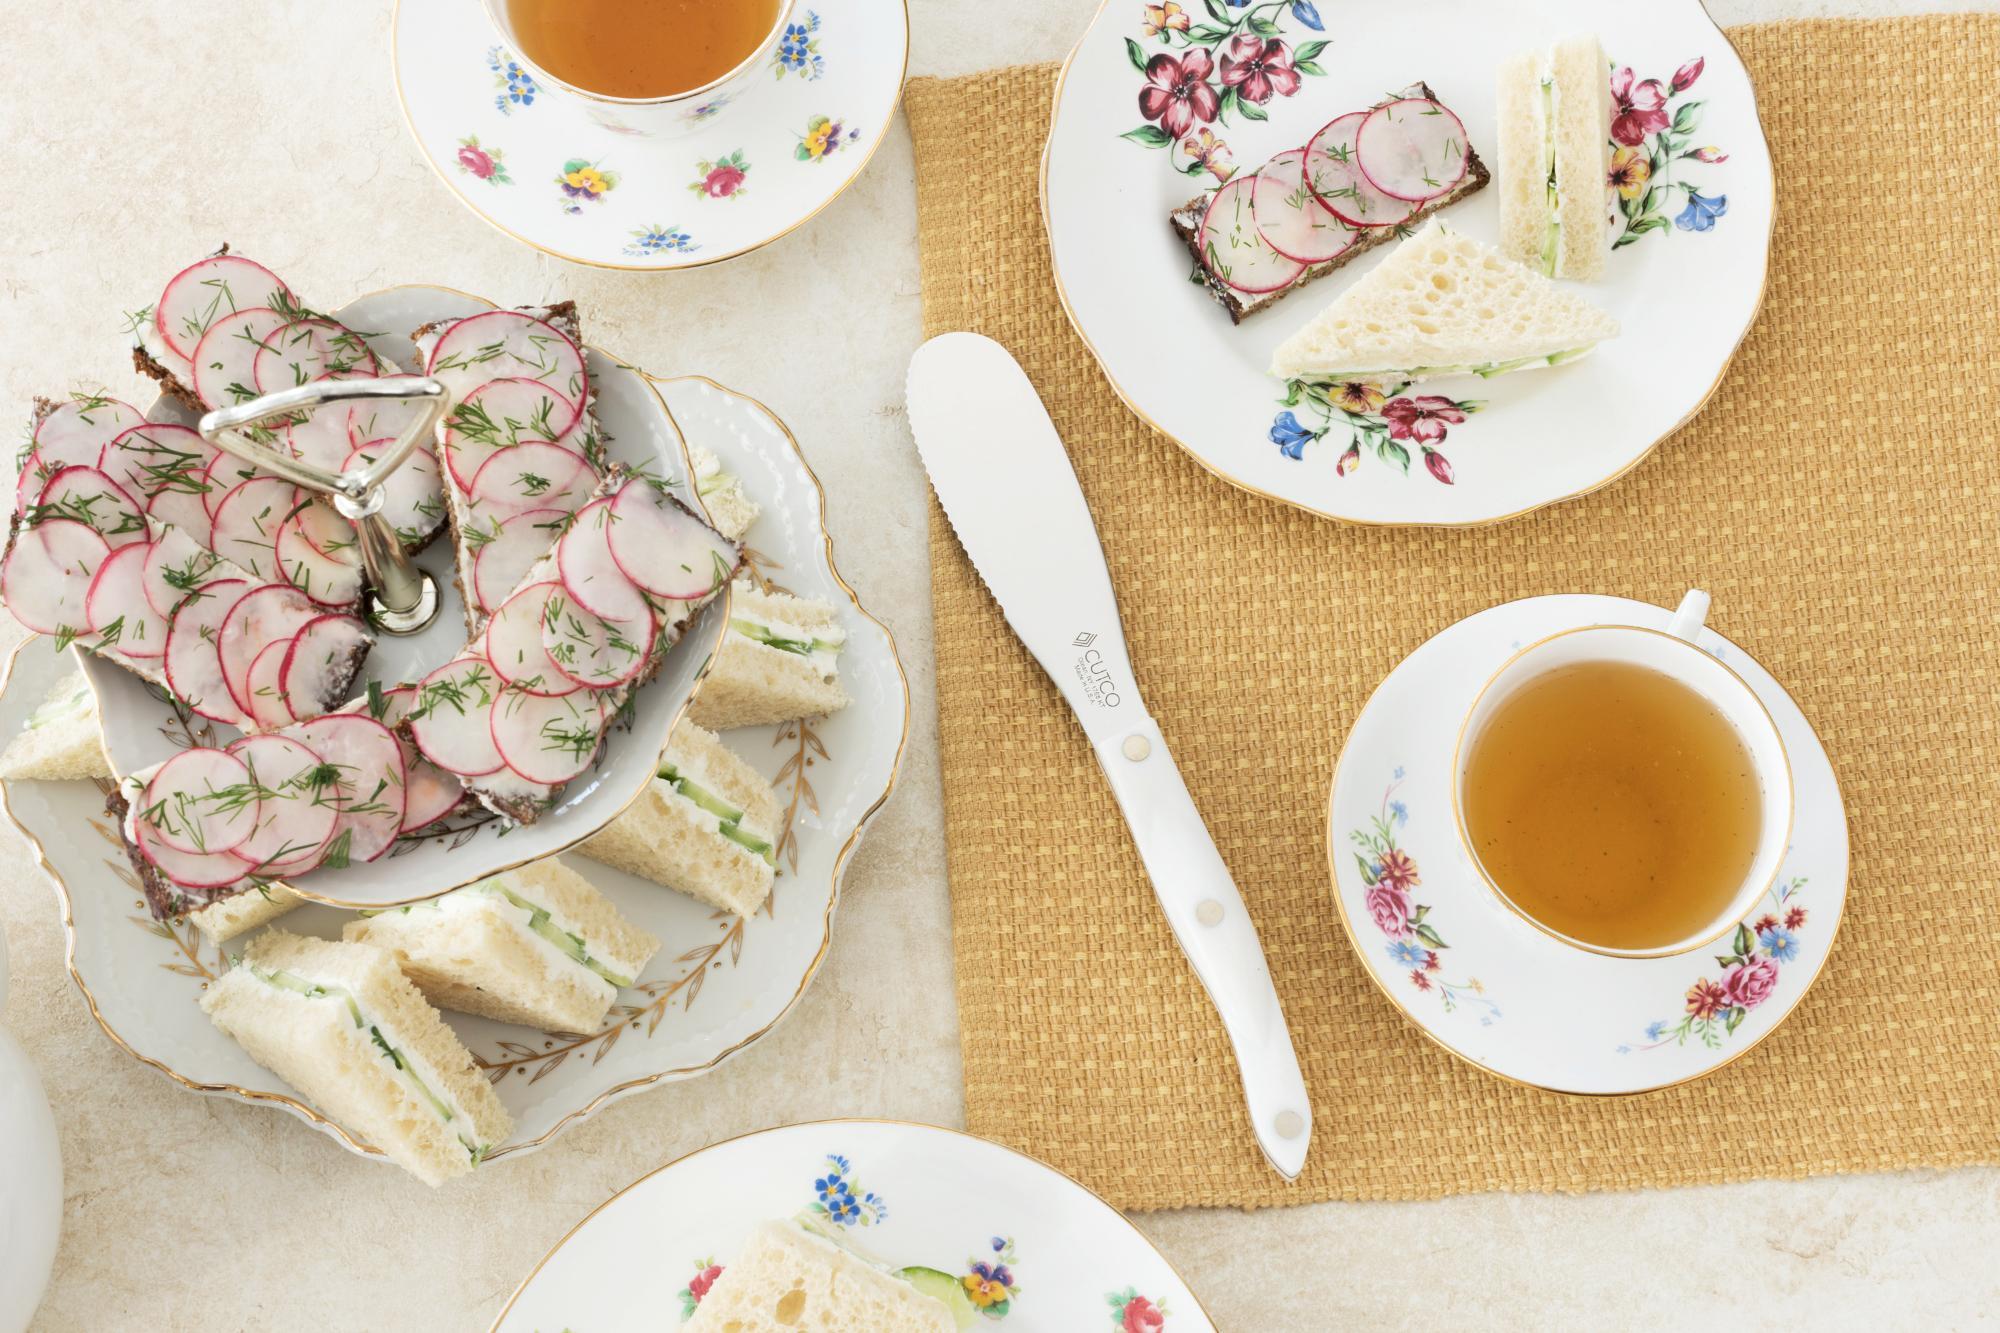 Assortment of tea sandwiches.